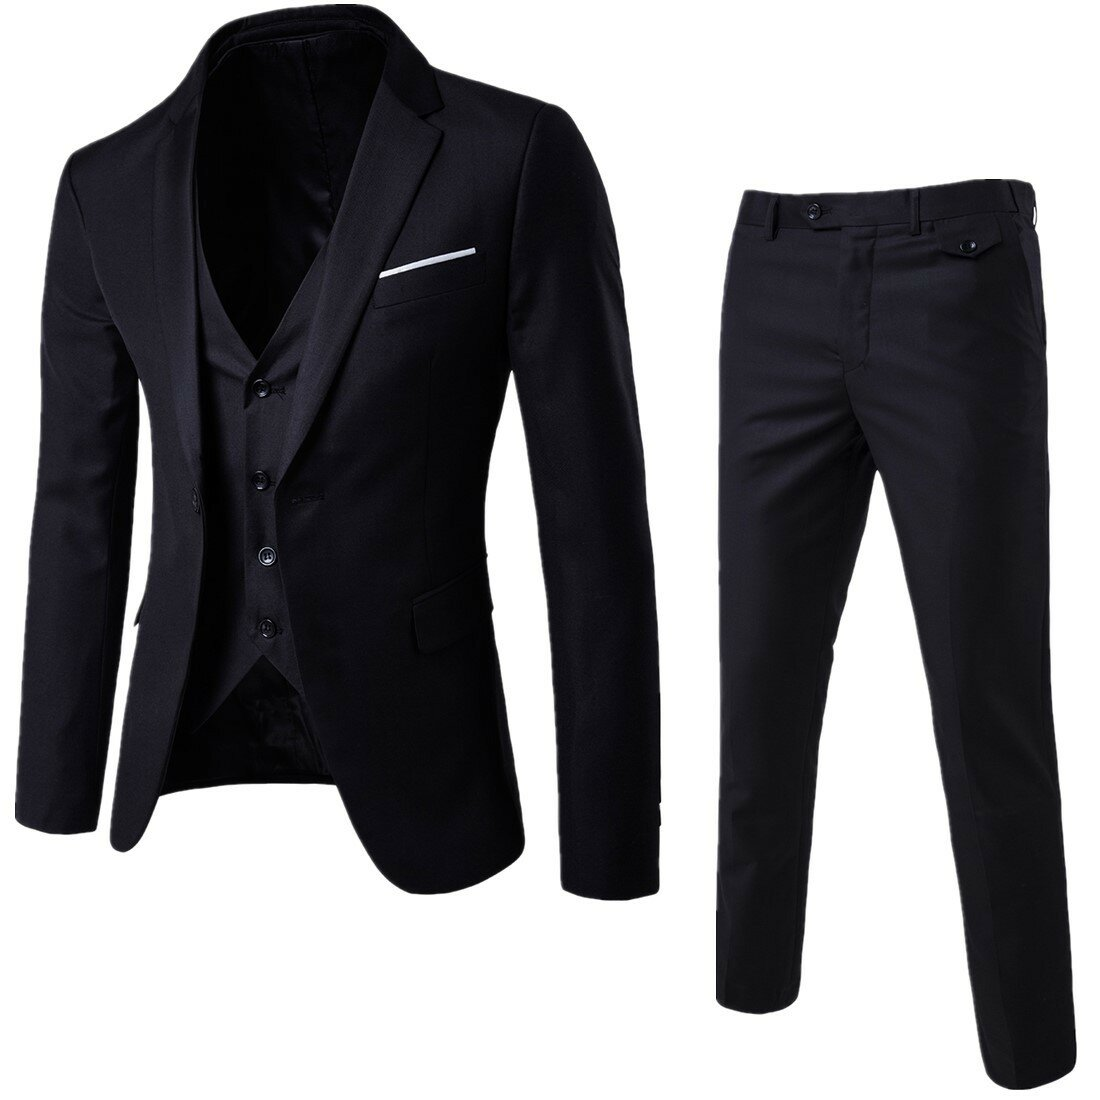 Three Pieces Suit for Men - 10